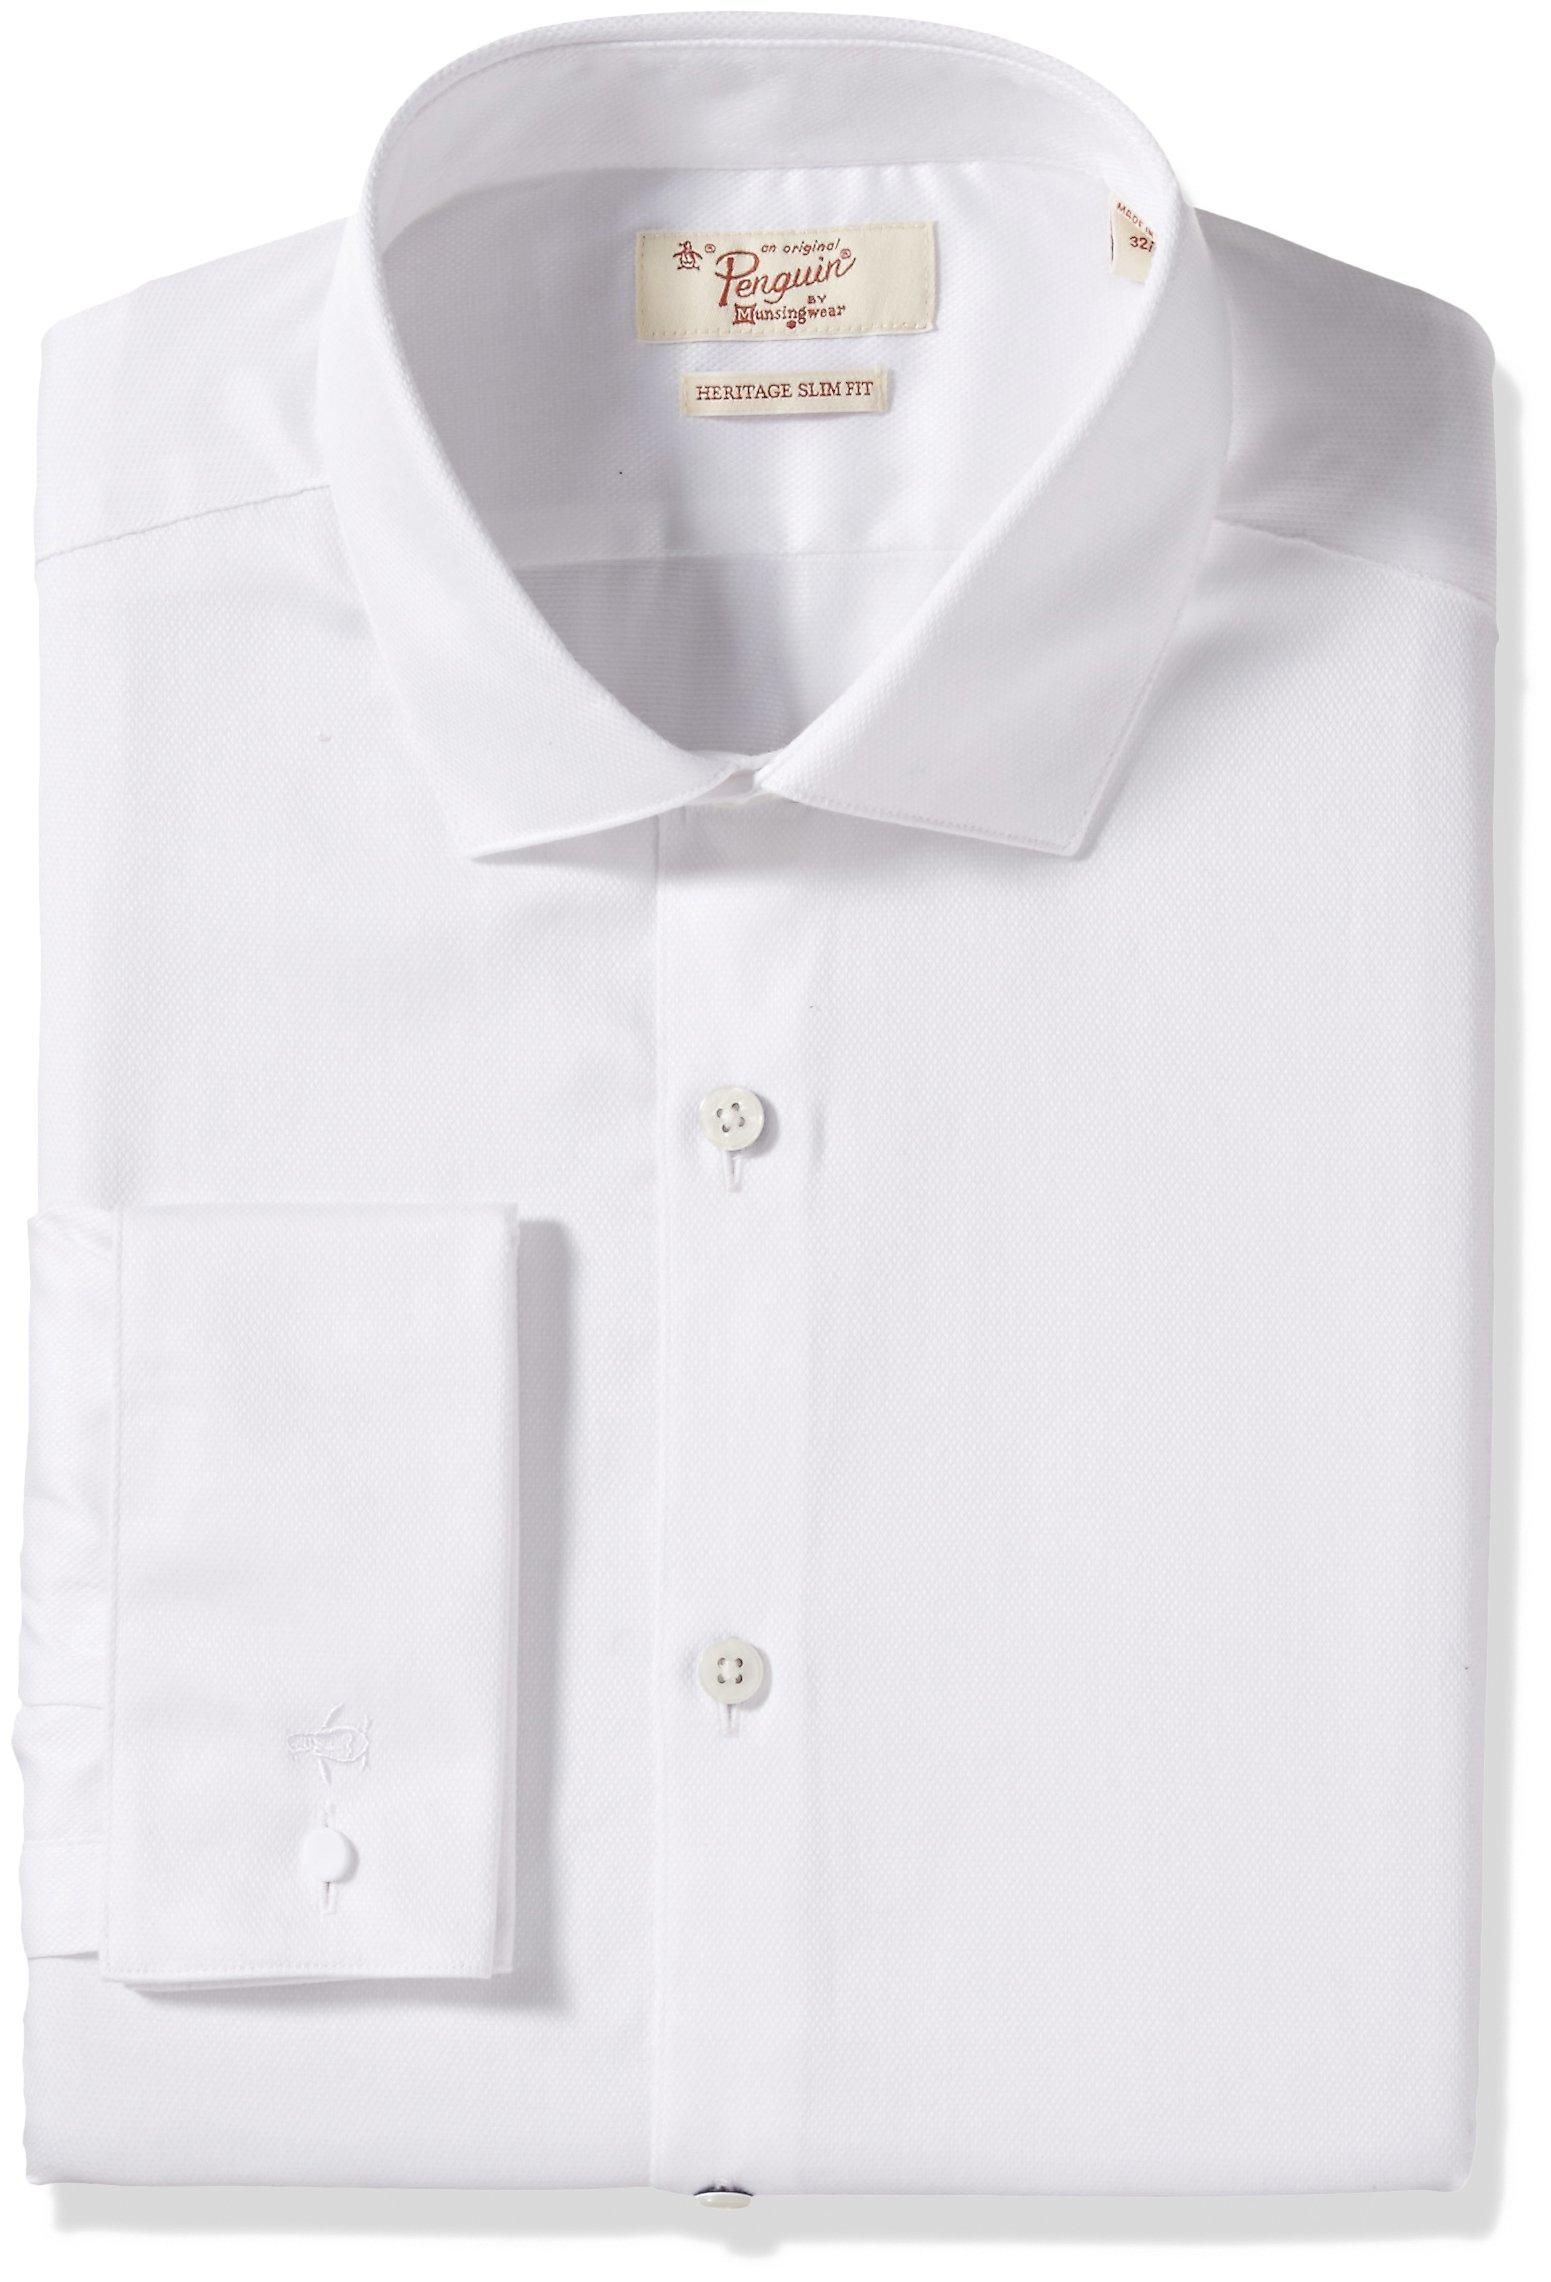 Original Penguin Men's Slim Fit Performance Dress Shirt, White, 16 34/35